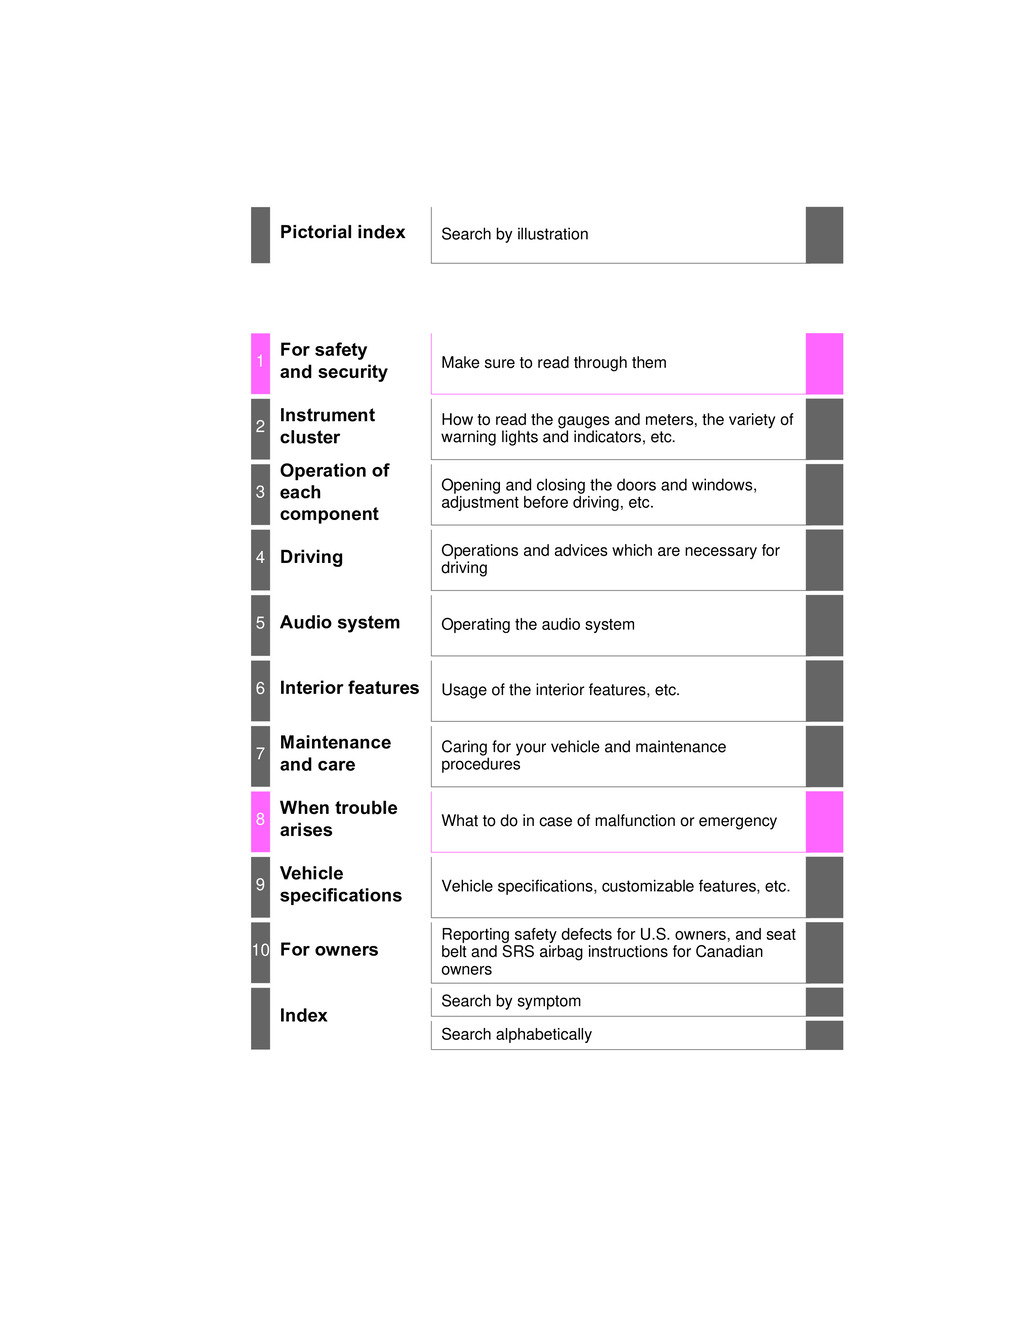 2015 Toyota Prius C owners manual